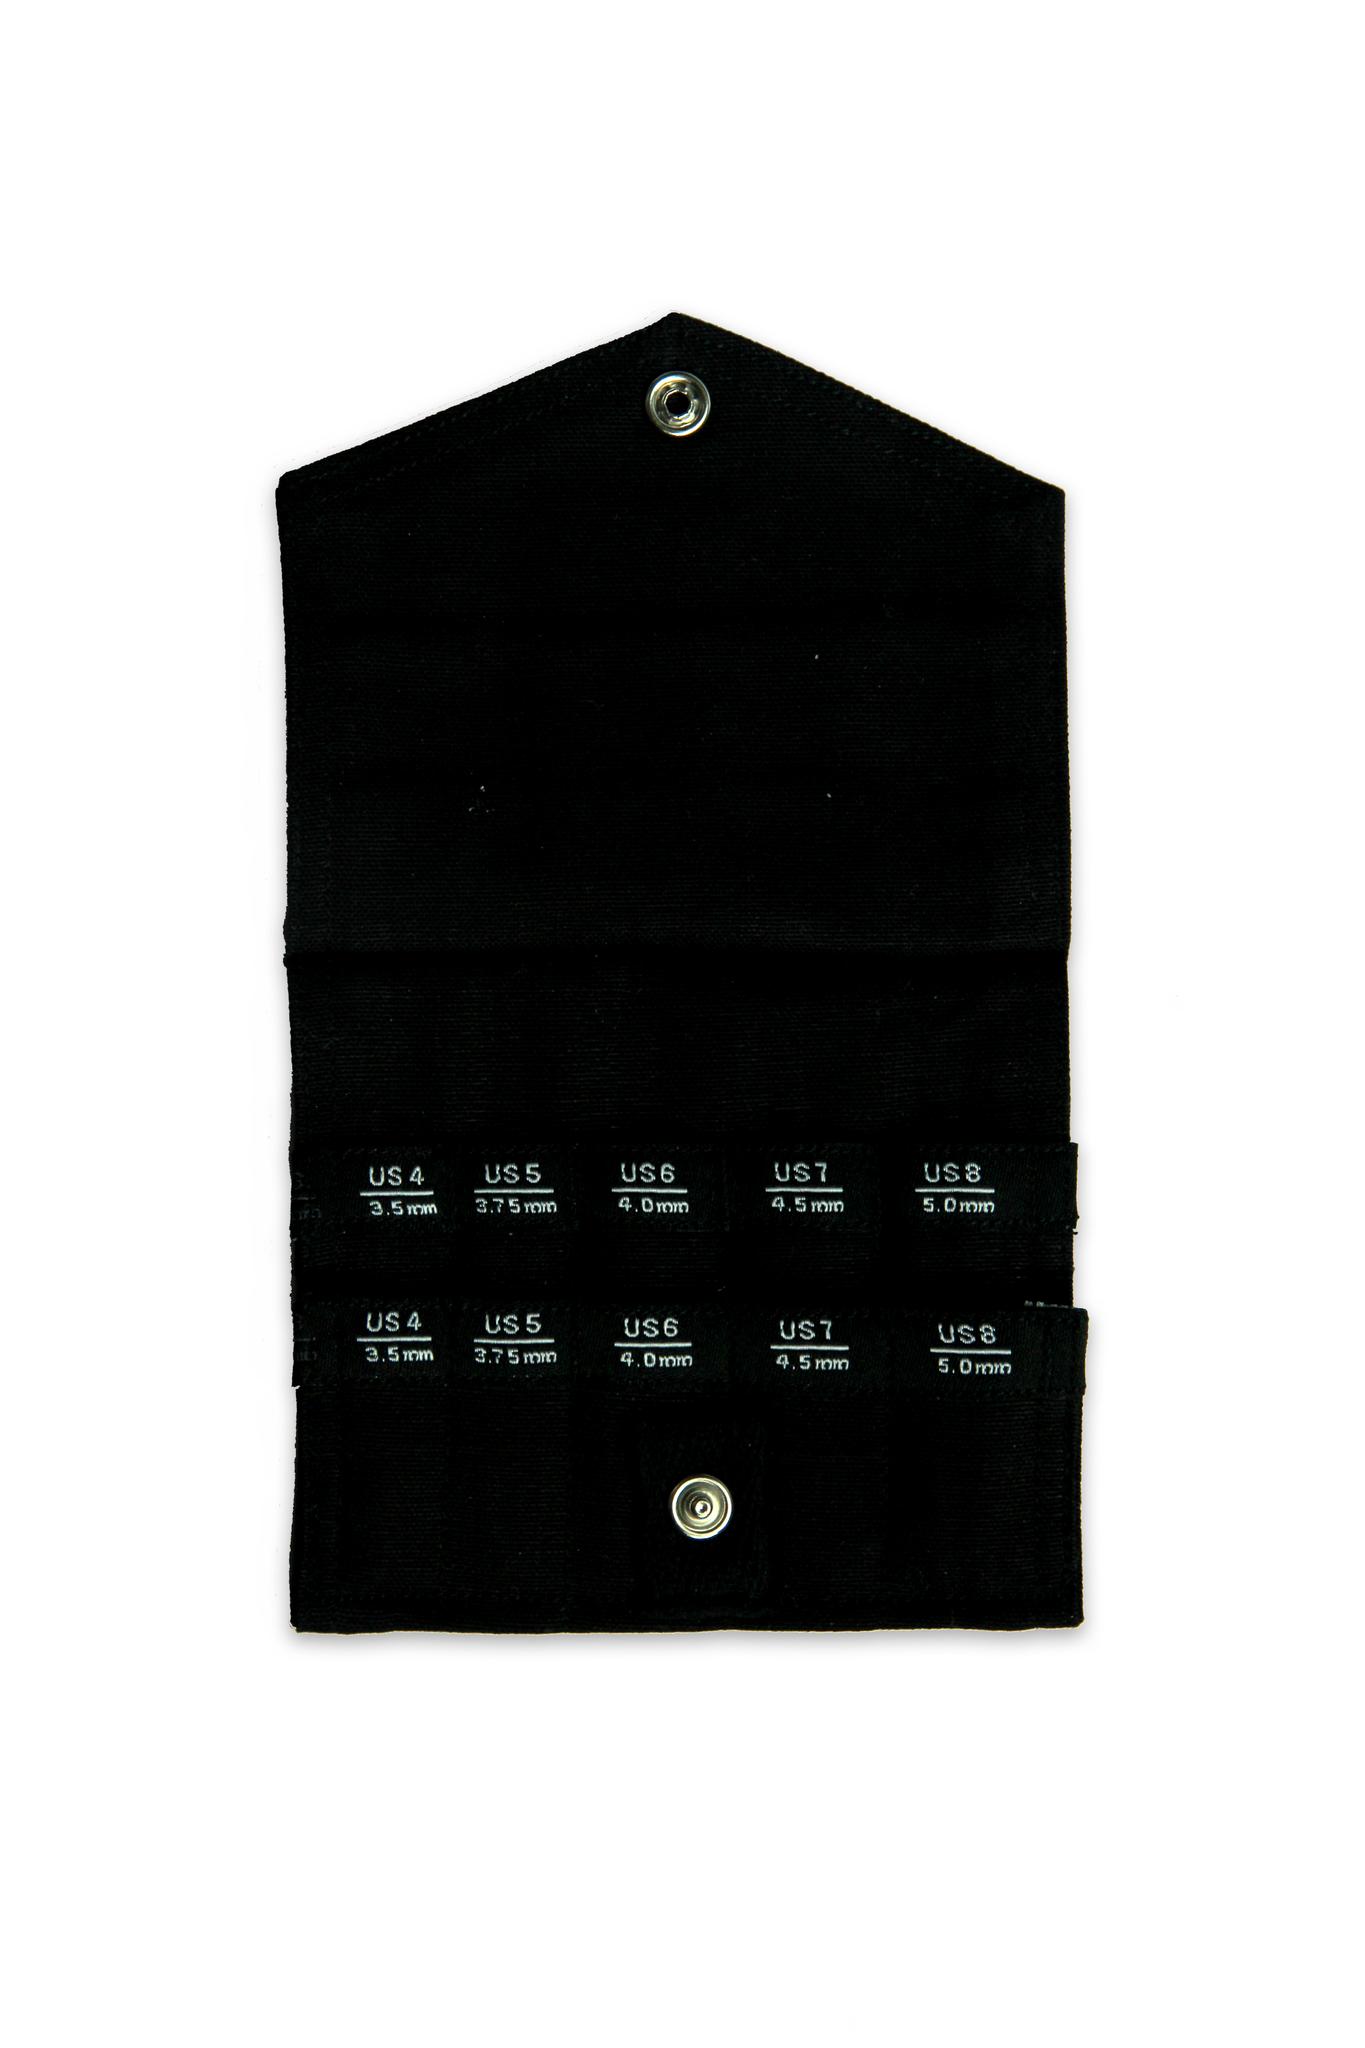 2577-S Вкладыш-органайзер для хранения укорочённых спиц, Small (5-8 см)